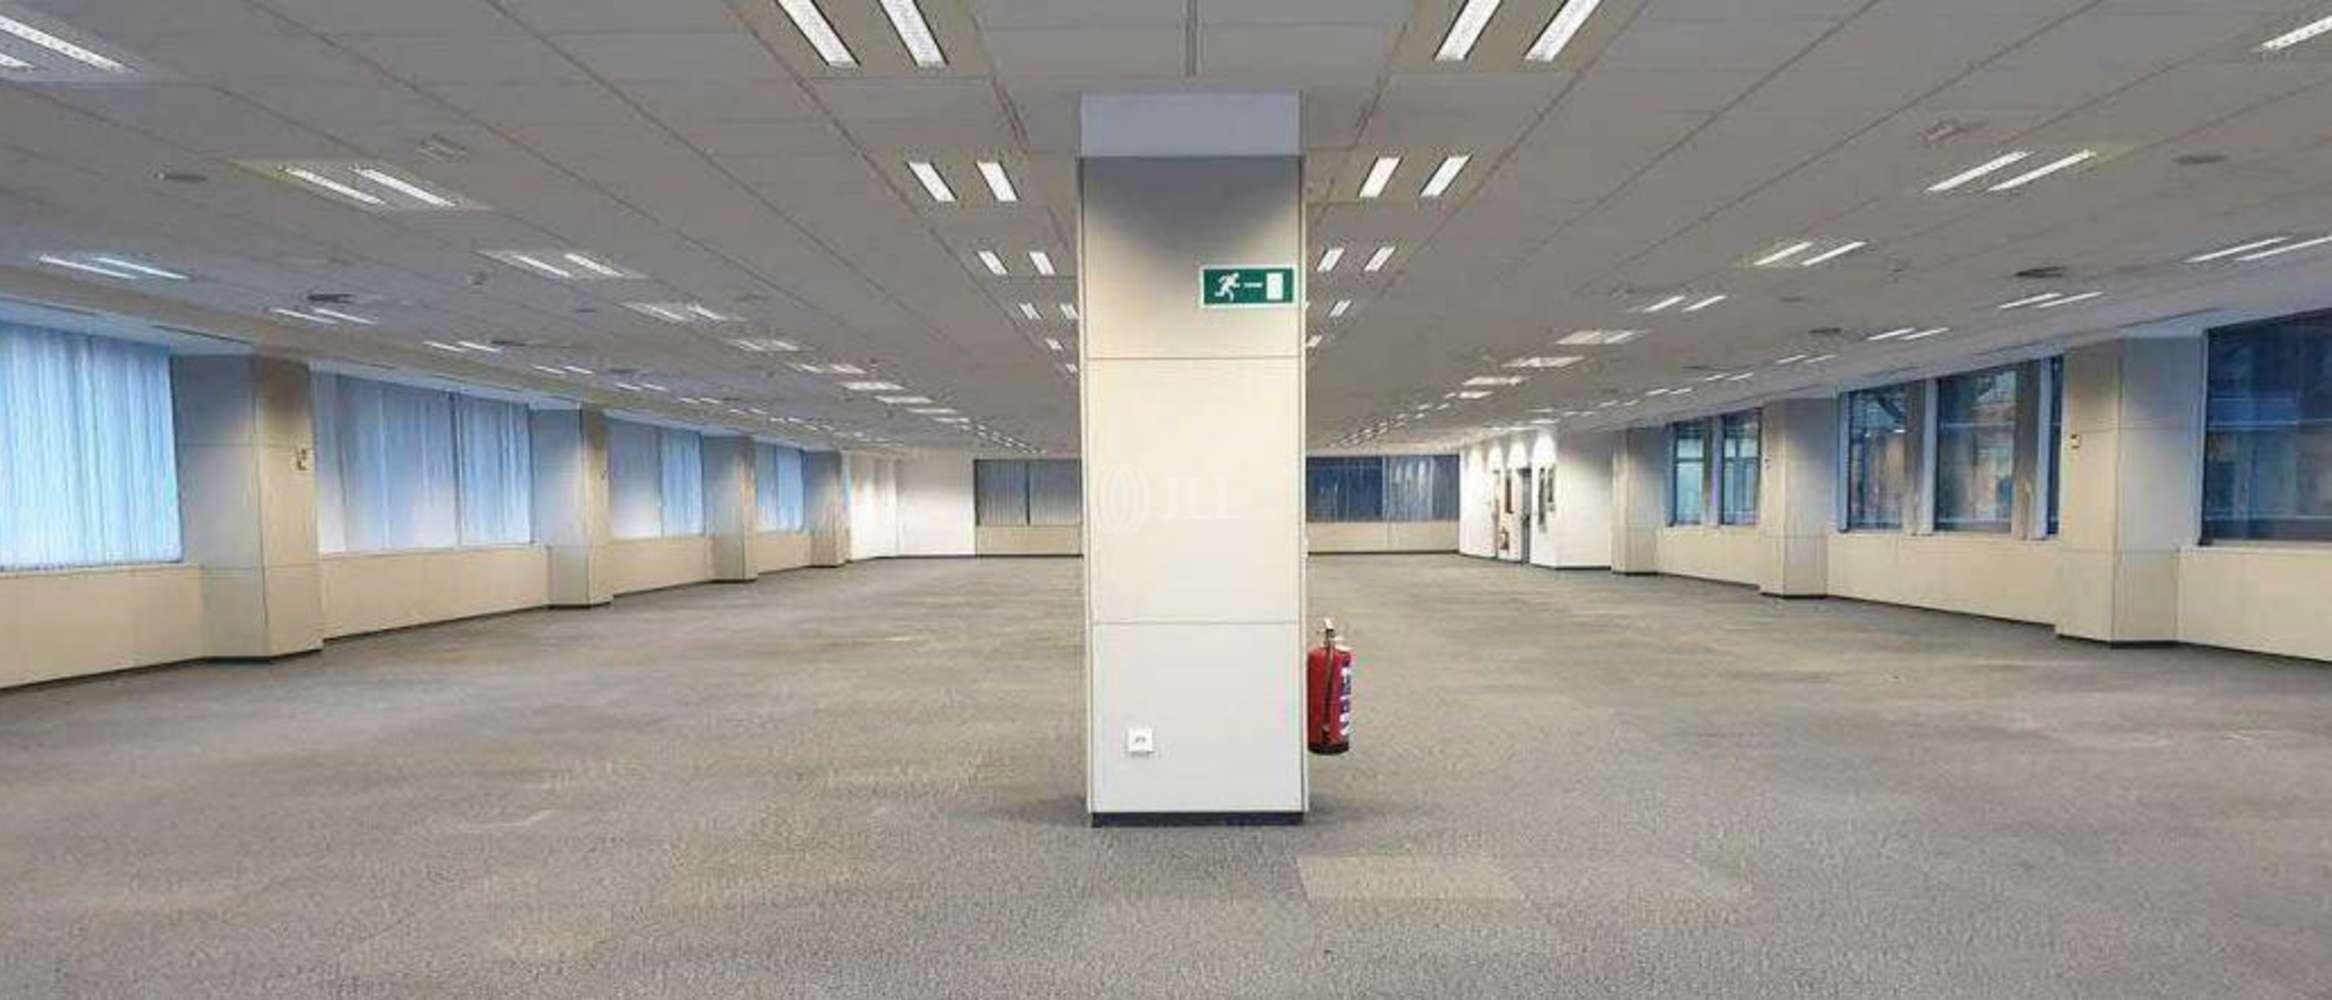 Oficina Tres cantos, 28760 - Edificios A y B